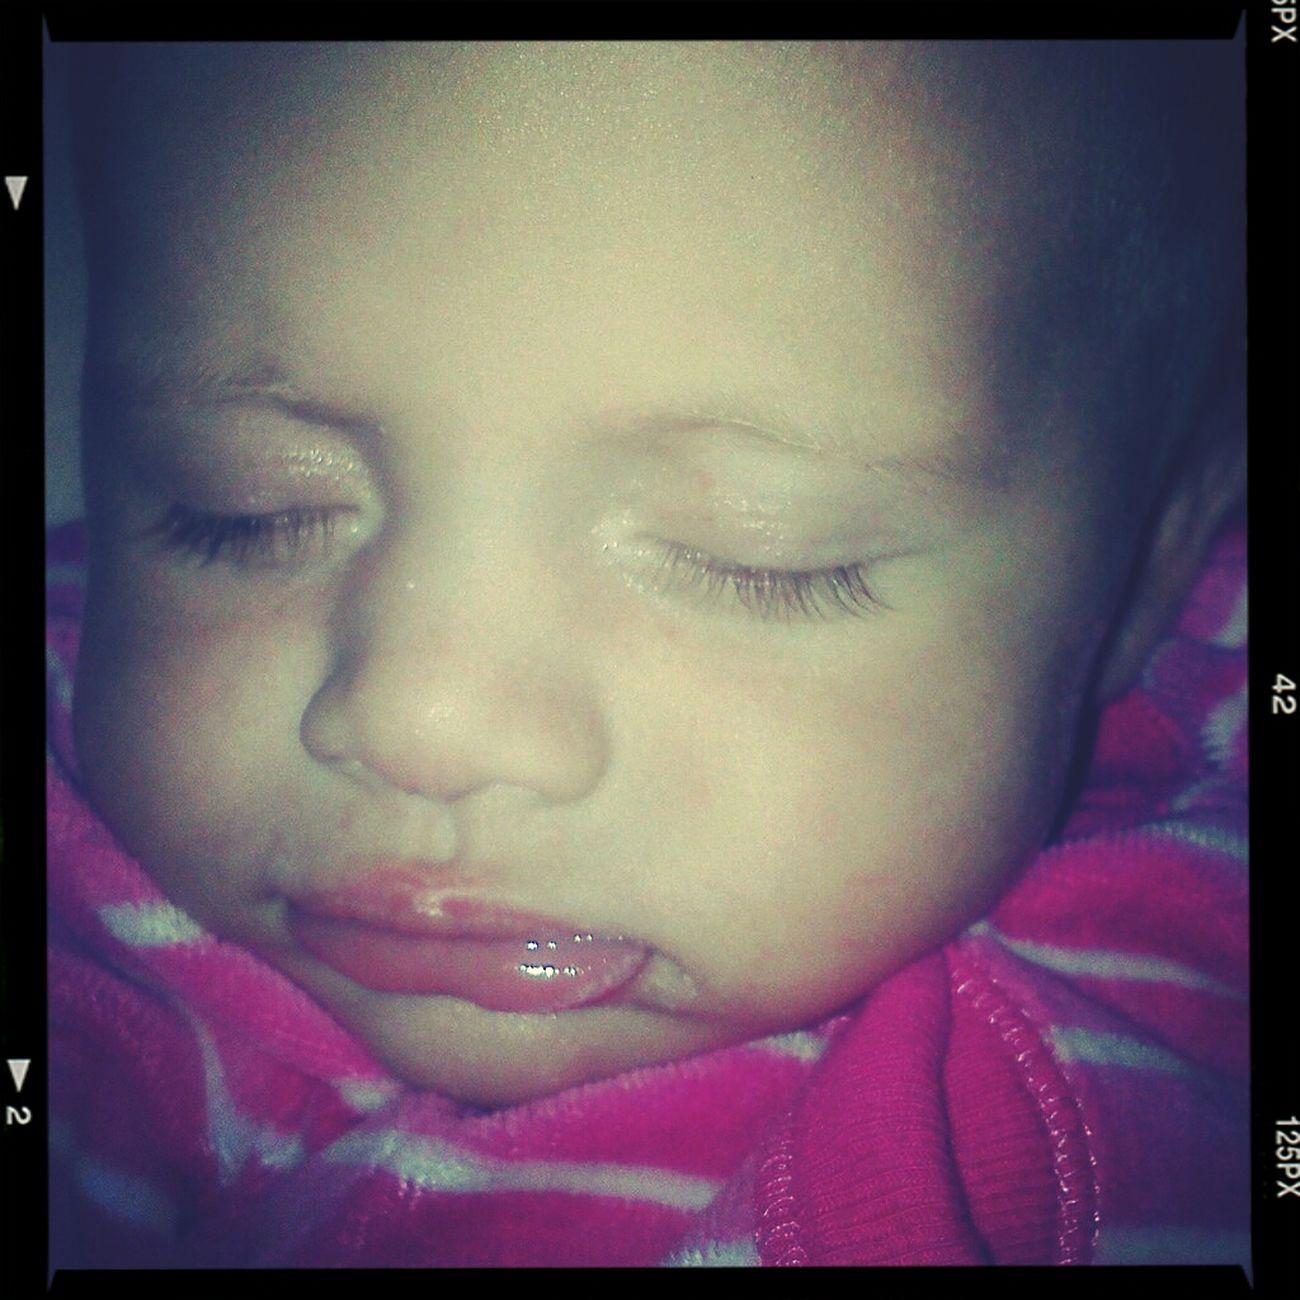 beauty sleep Sleeping Cute♡ My Baby Photo My Baby